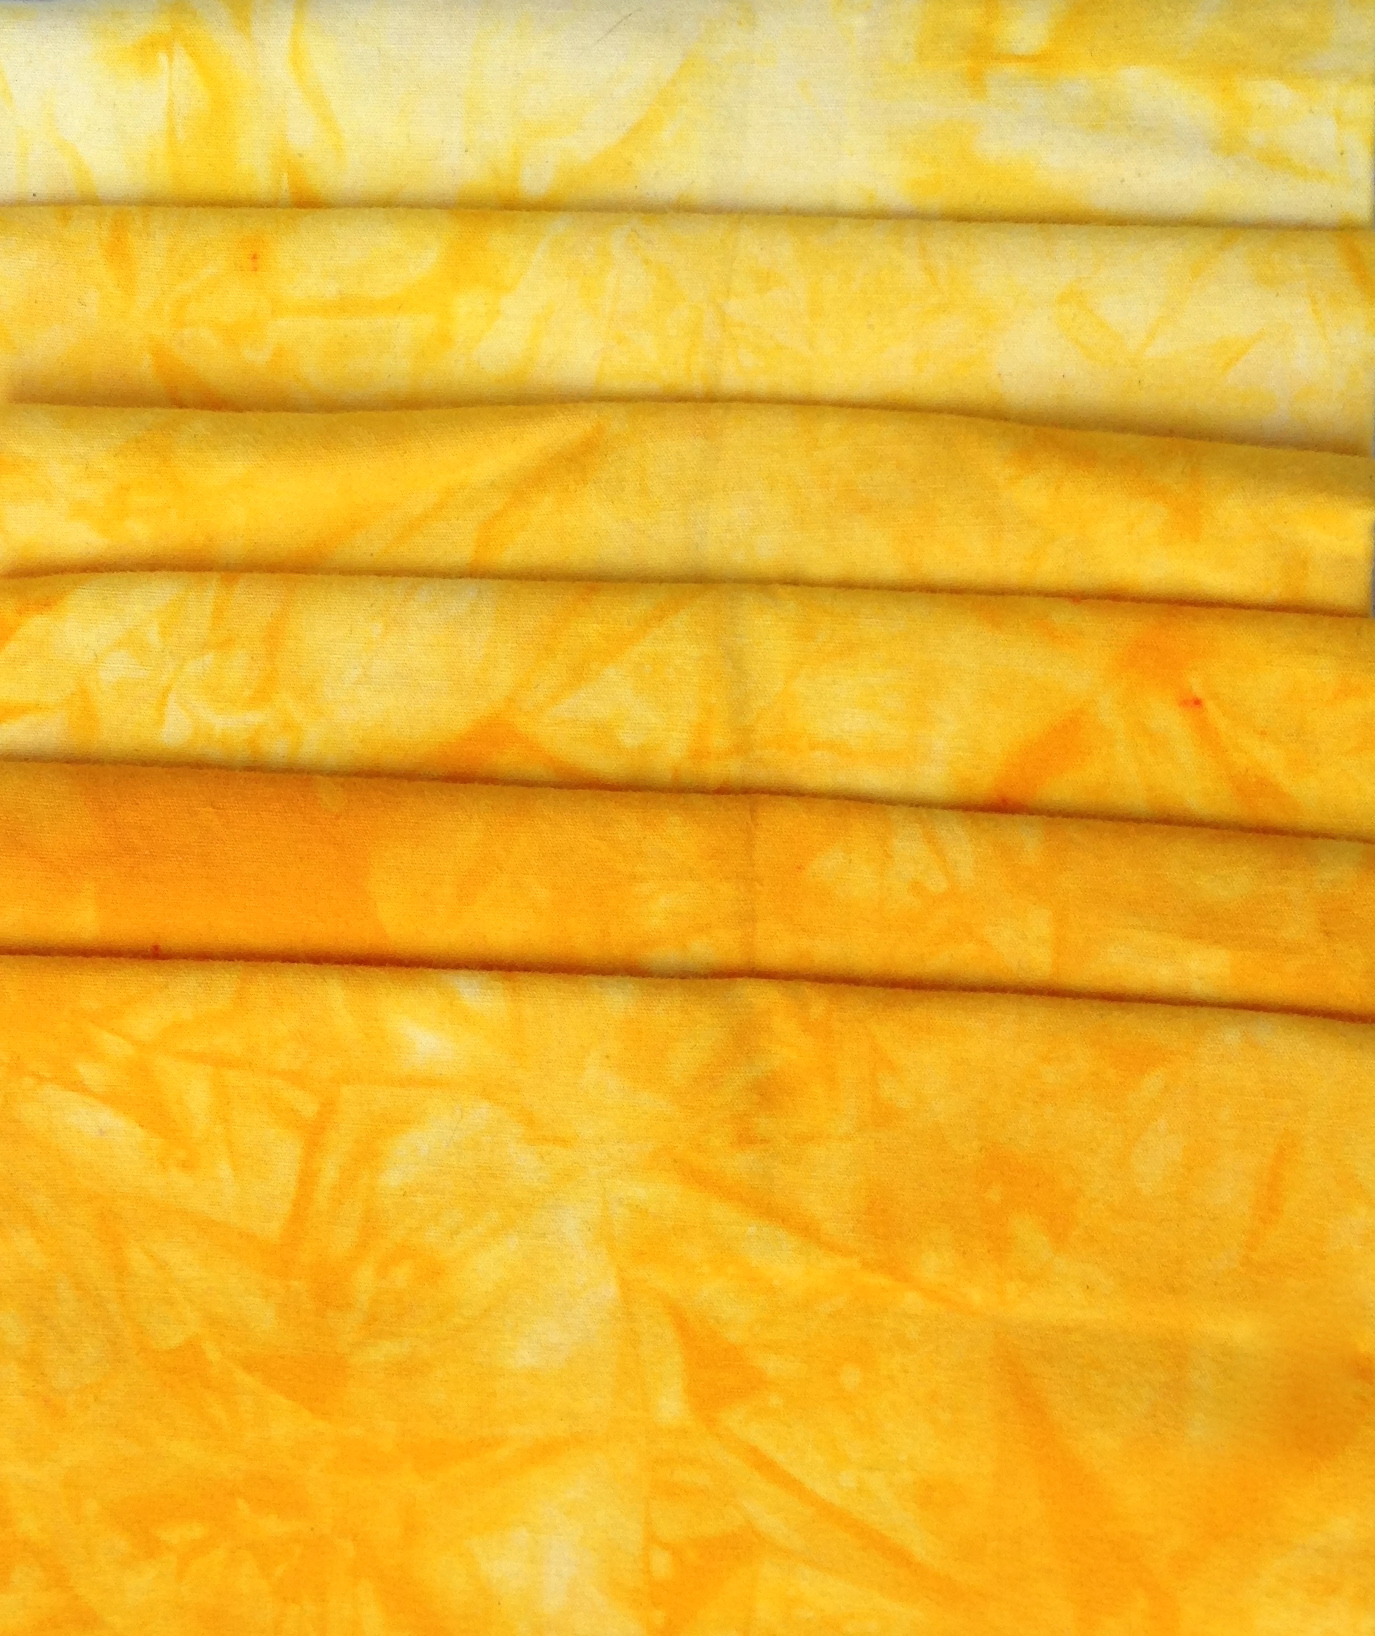 Golden Yellow to Lemon